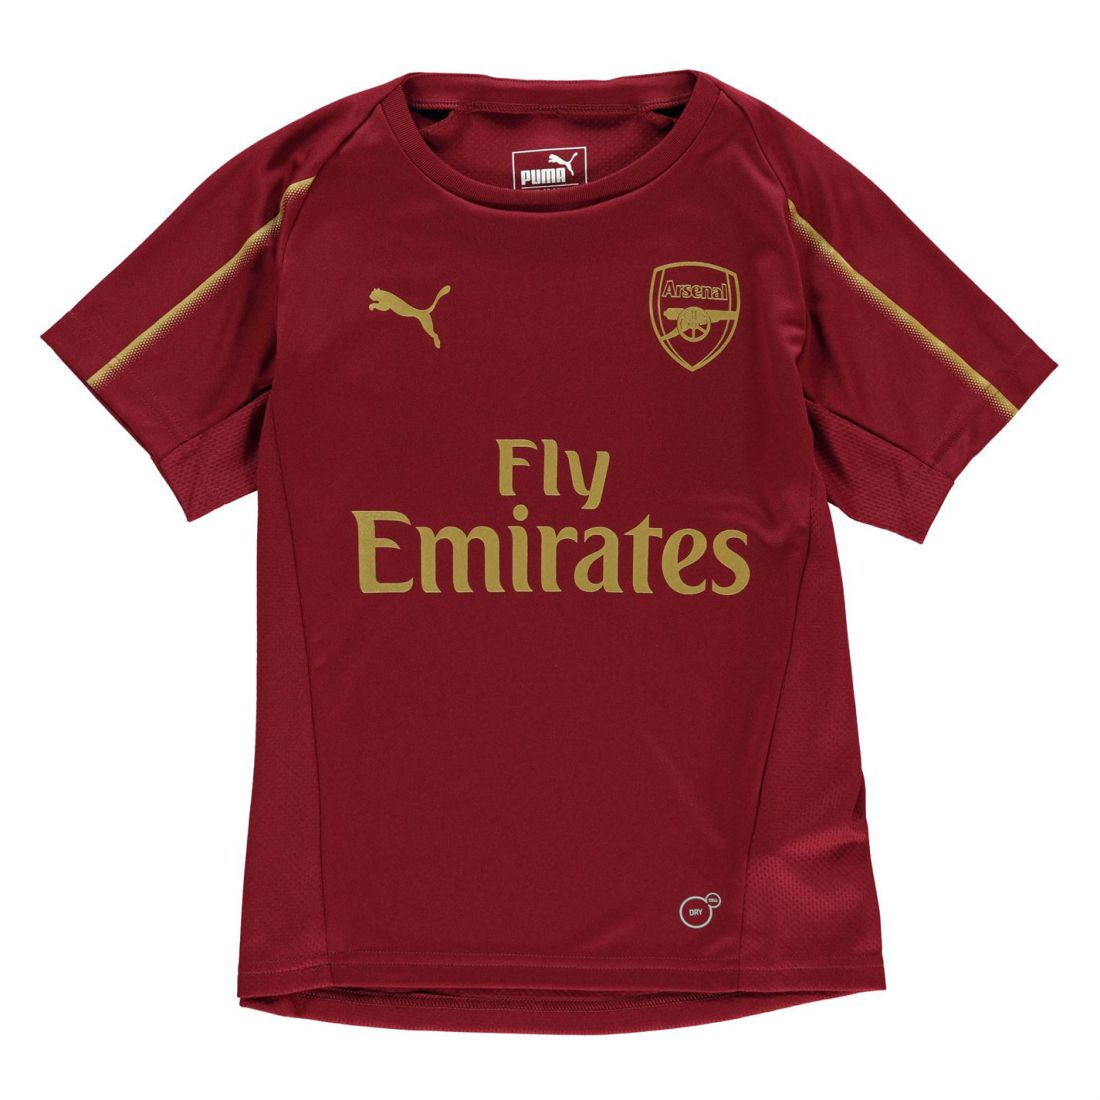 d50f06c37d0 Puma Kids Boys Arsenal Training Shirt 2018 2019 Junior Short Sleeve ...